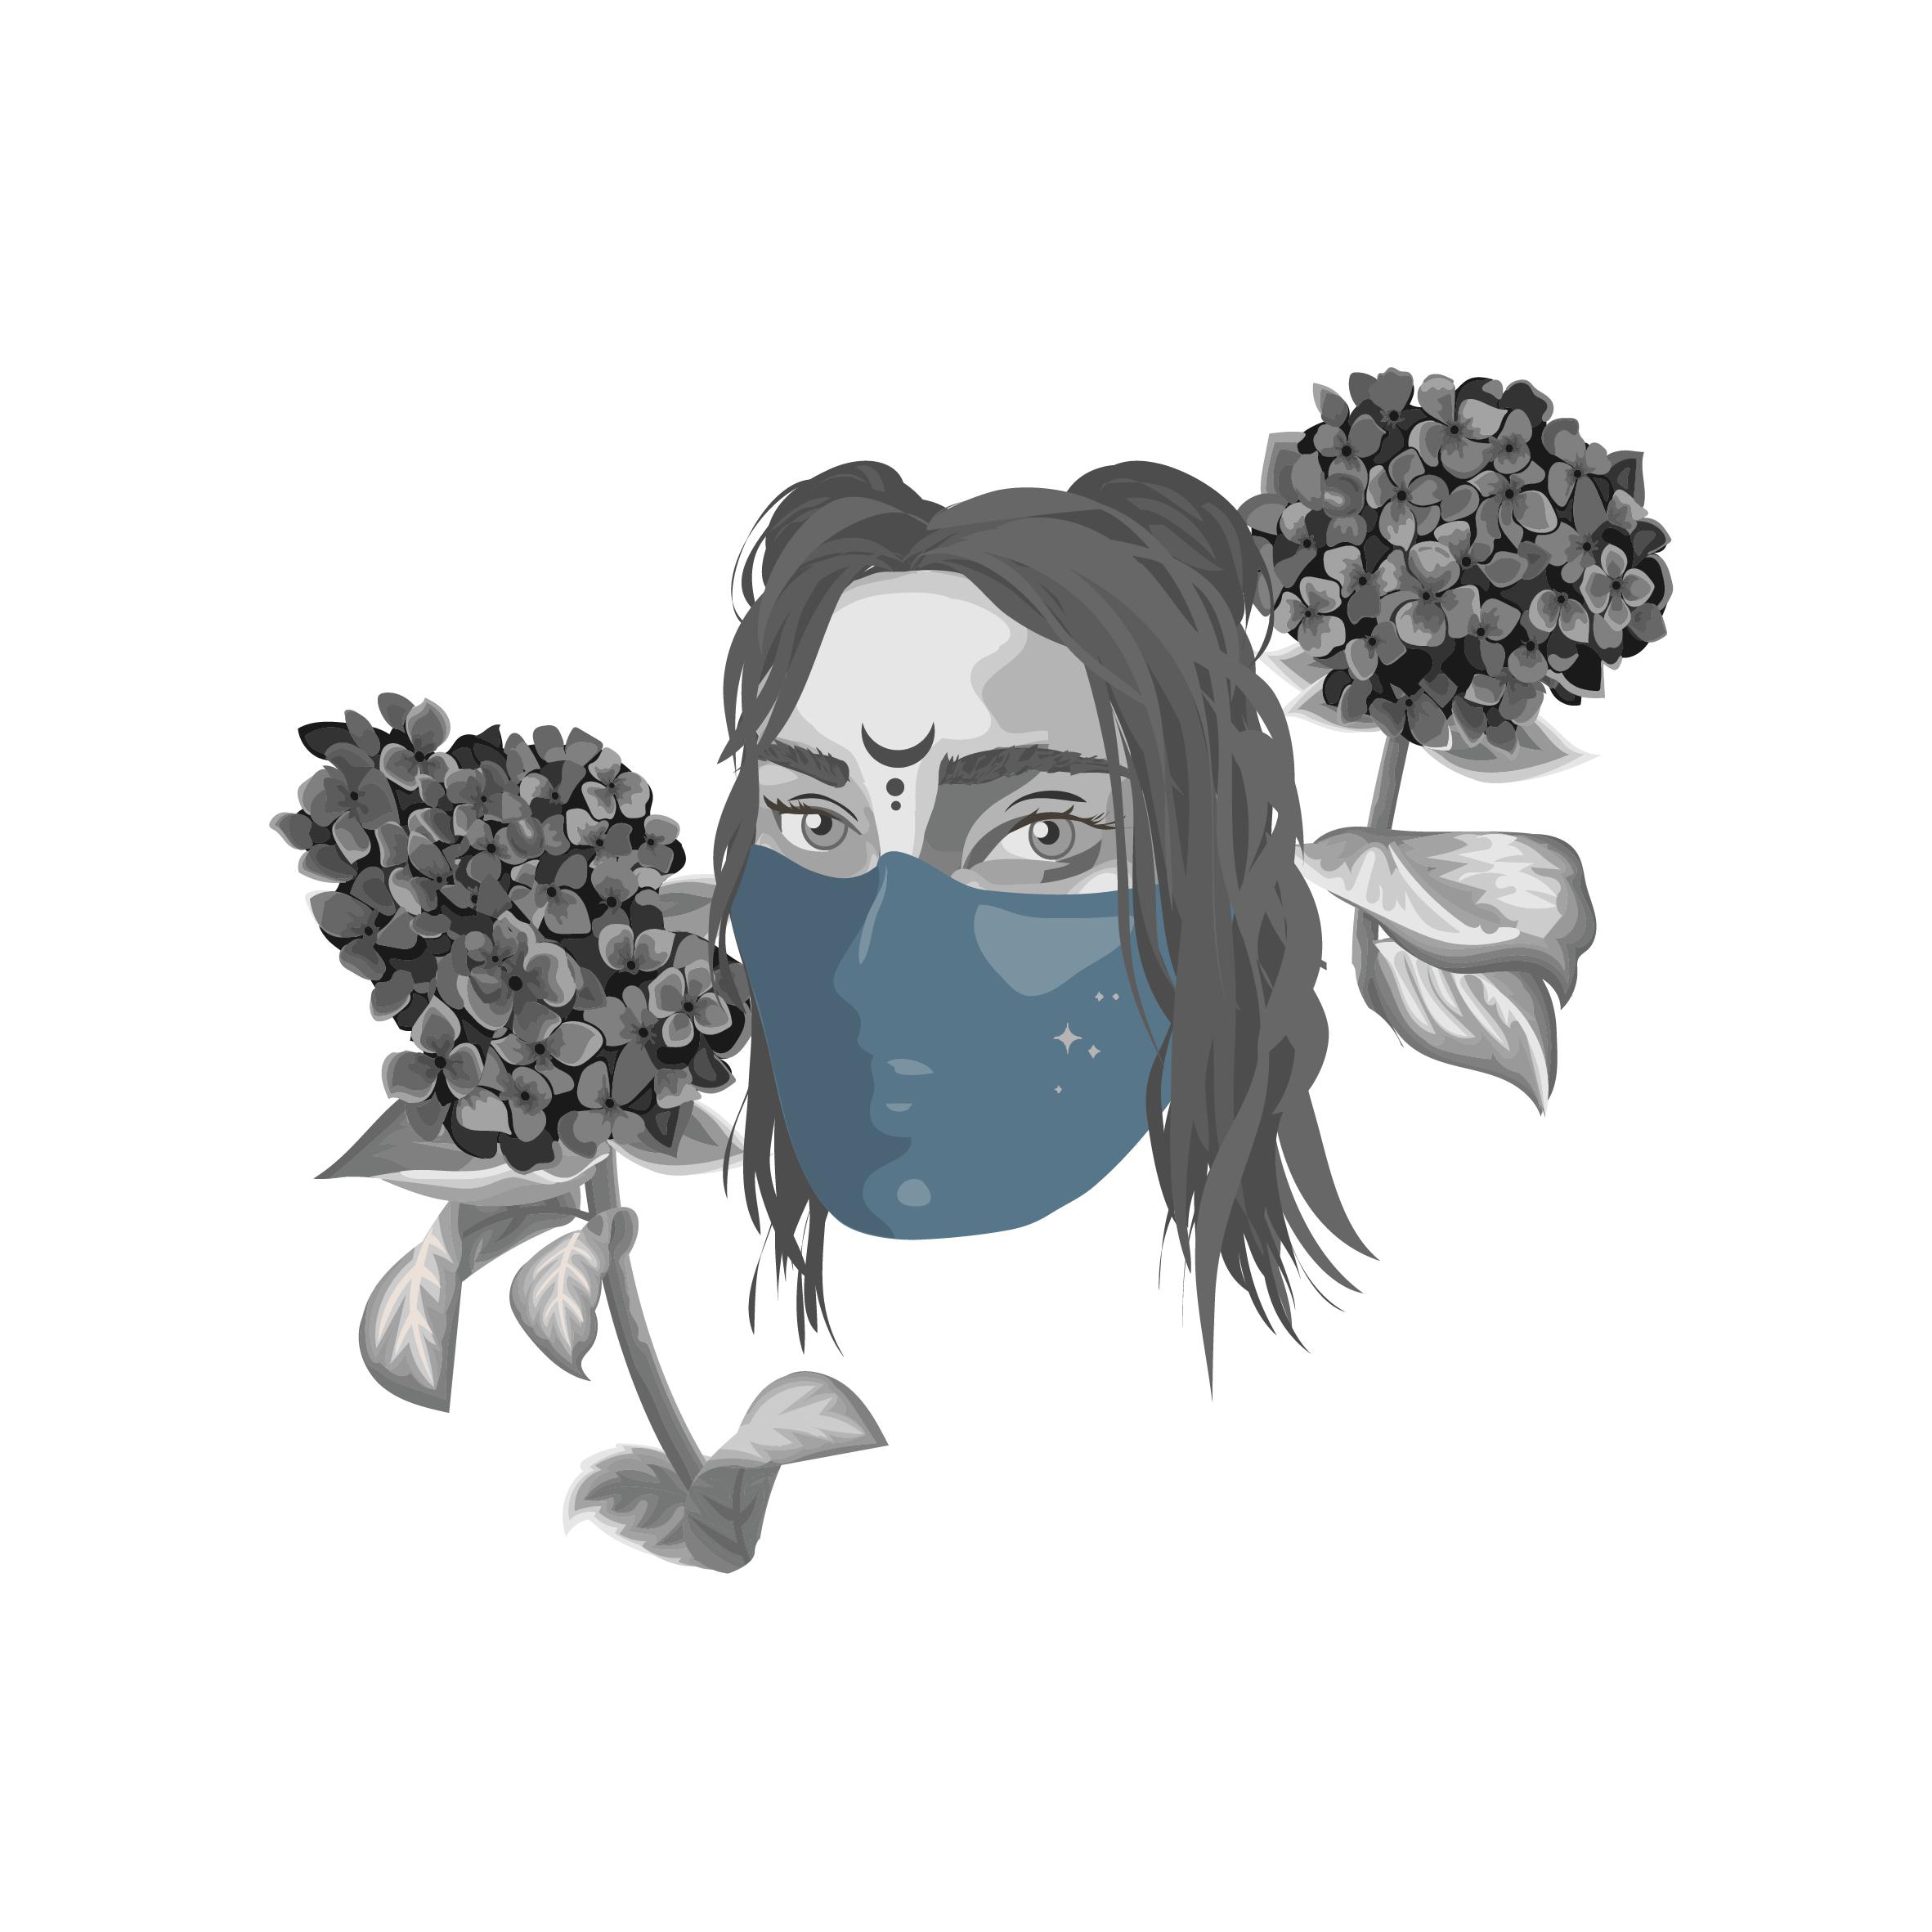 26. Mask